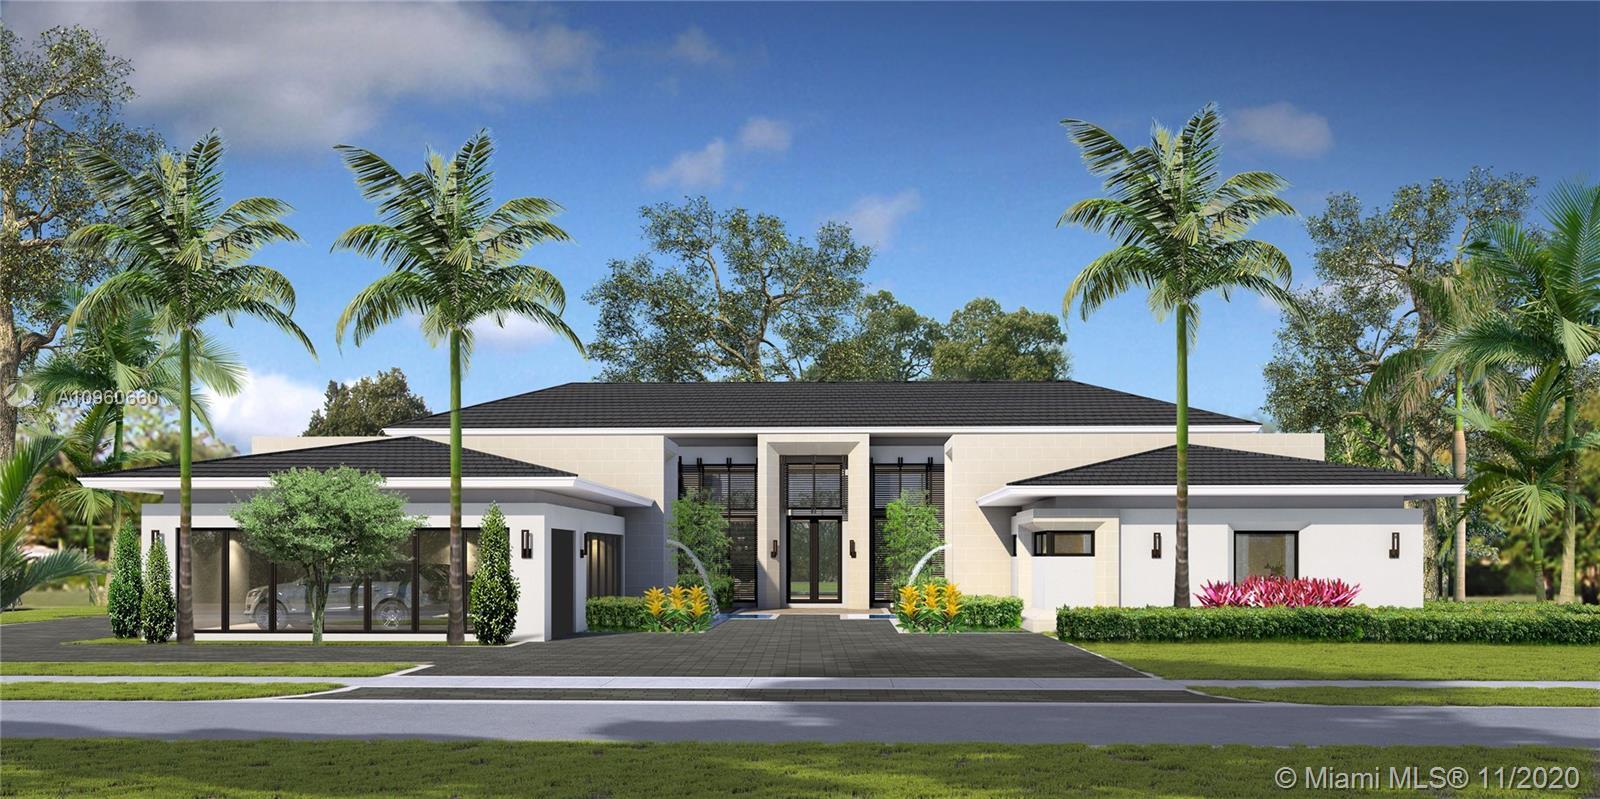 14910 Sw 16th Ct Property Photo